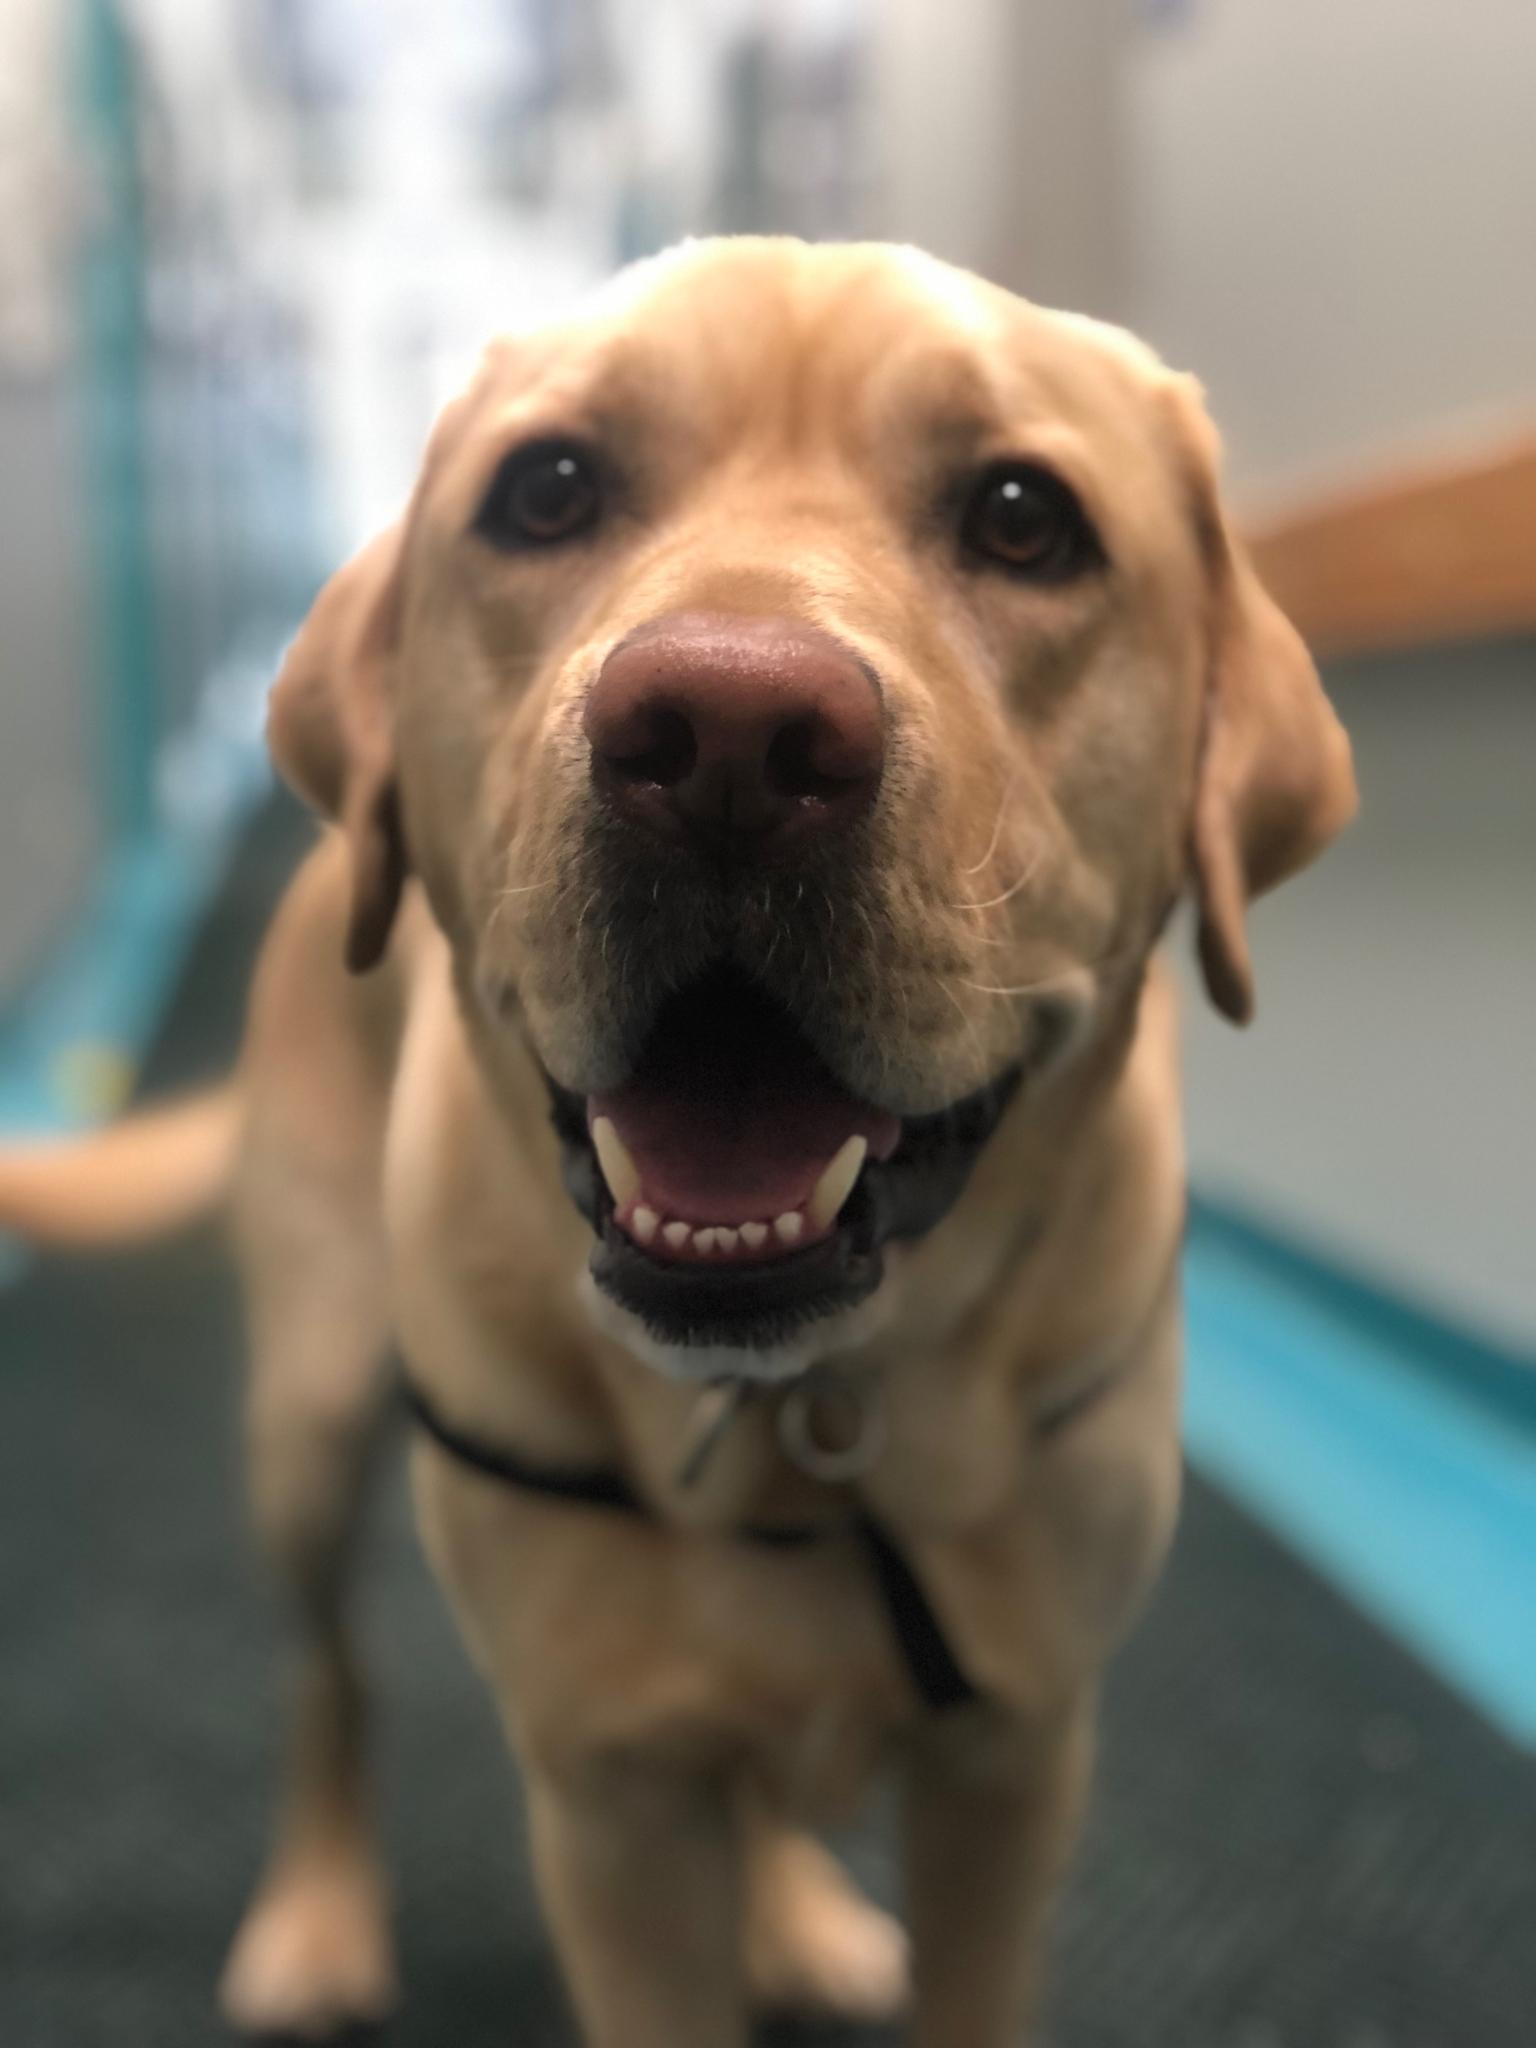 Facility dog Pongo in the hallway